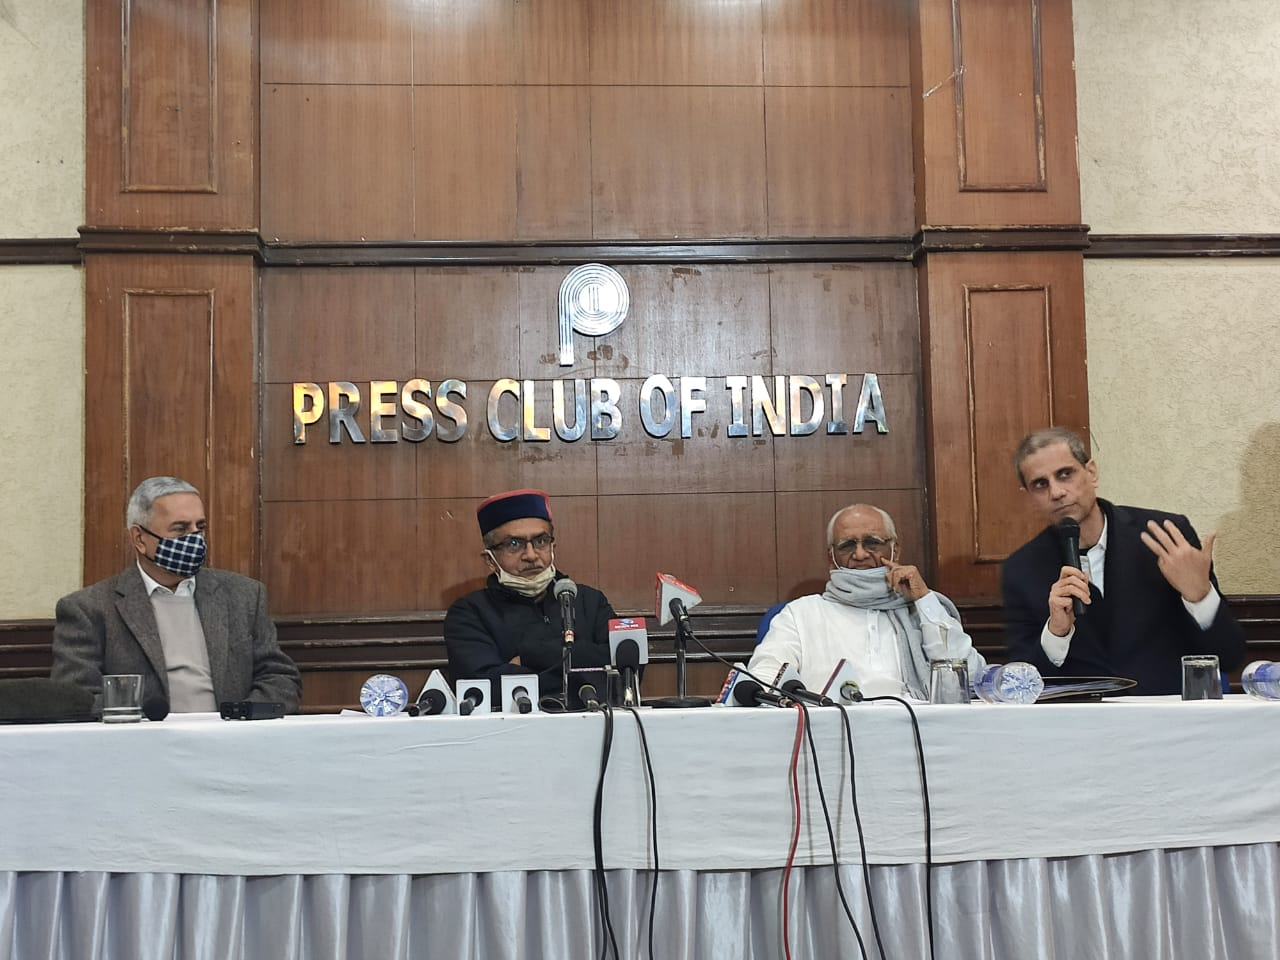 Raid On Mr. Mehmood Prachas Office Illegal, Says Justice Kolse Patil, Prashant Bhushan And Sr Advocate CU Singh